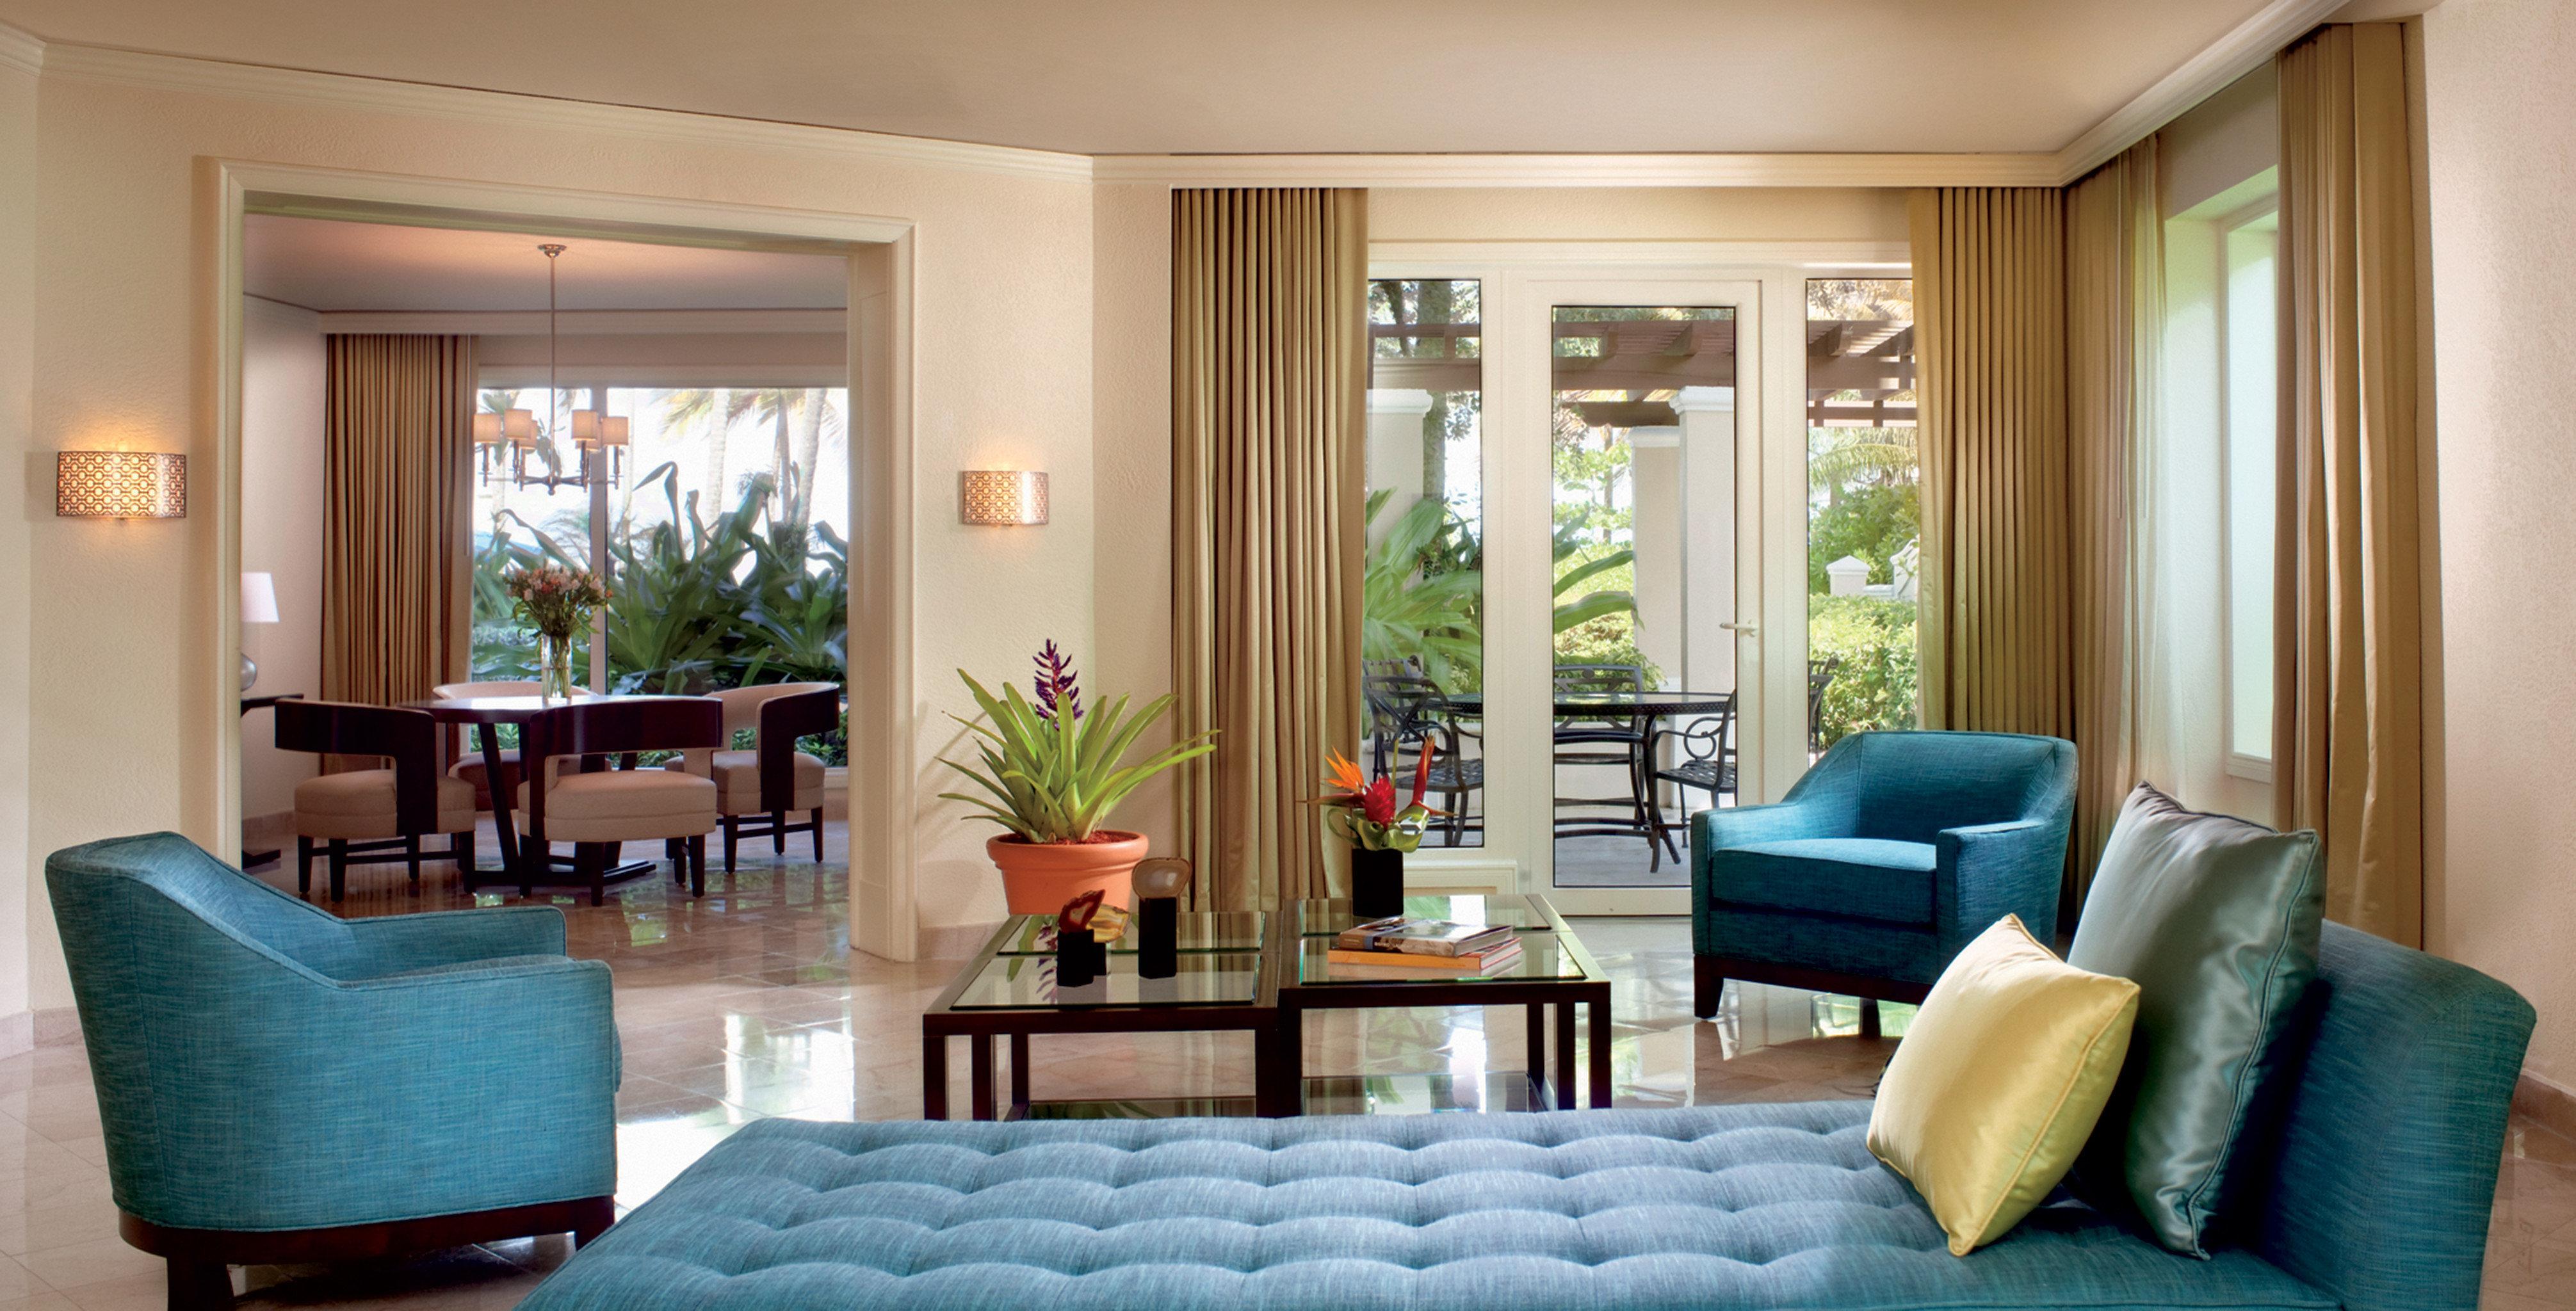 Classic Luxury Patio Resort Scenic views living room property chair condominium home Suite green Bedroom leather